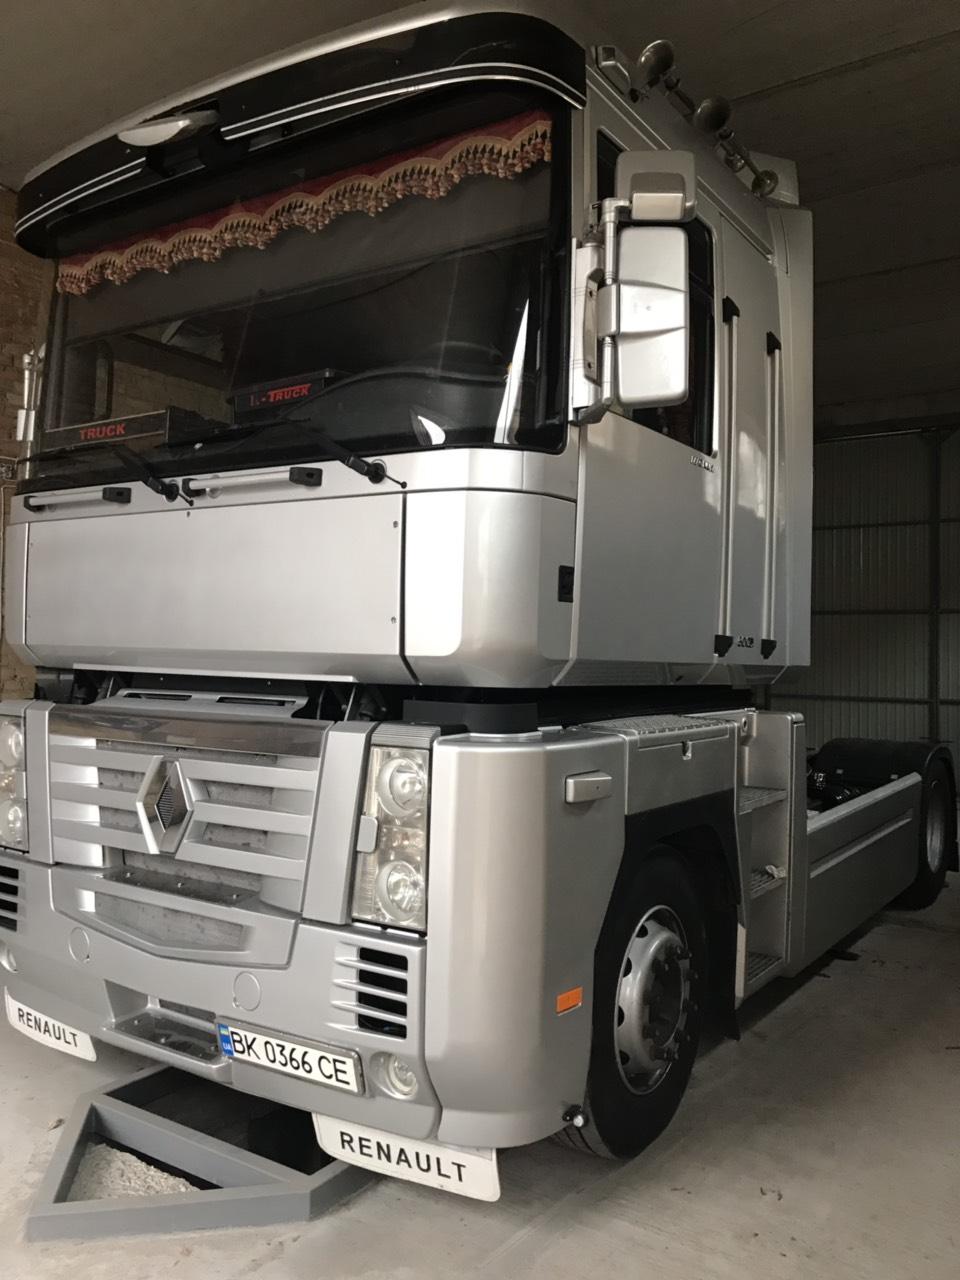 Установка гідравліки на тягач Renault Magnum 500 DXi Euro 5